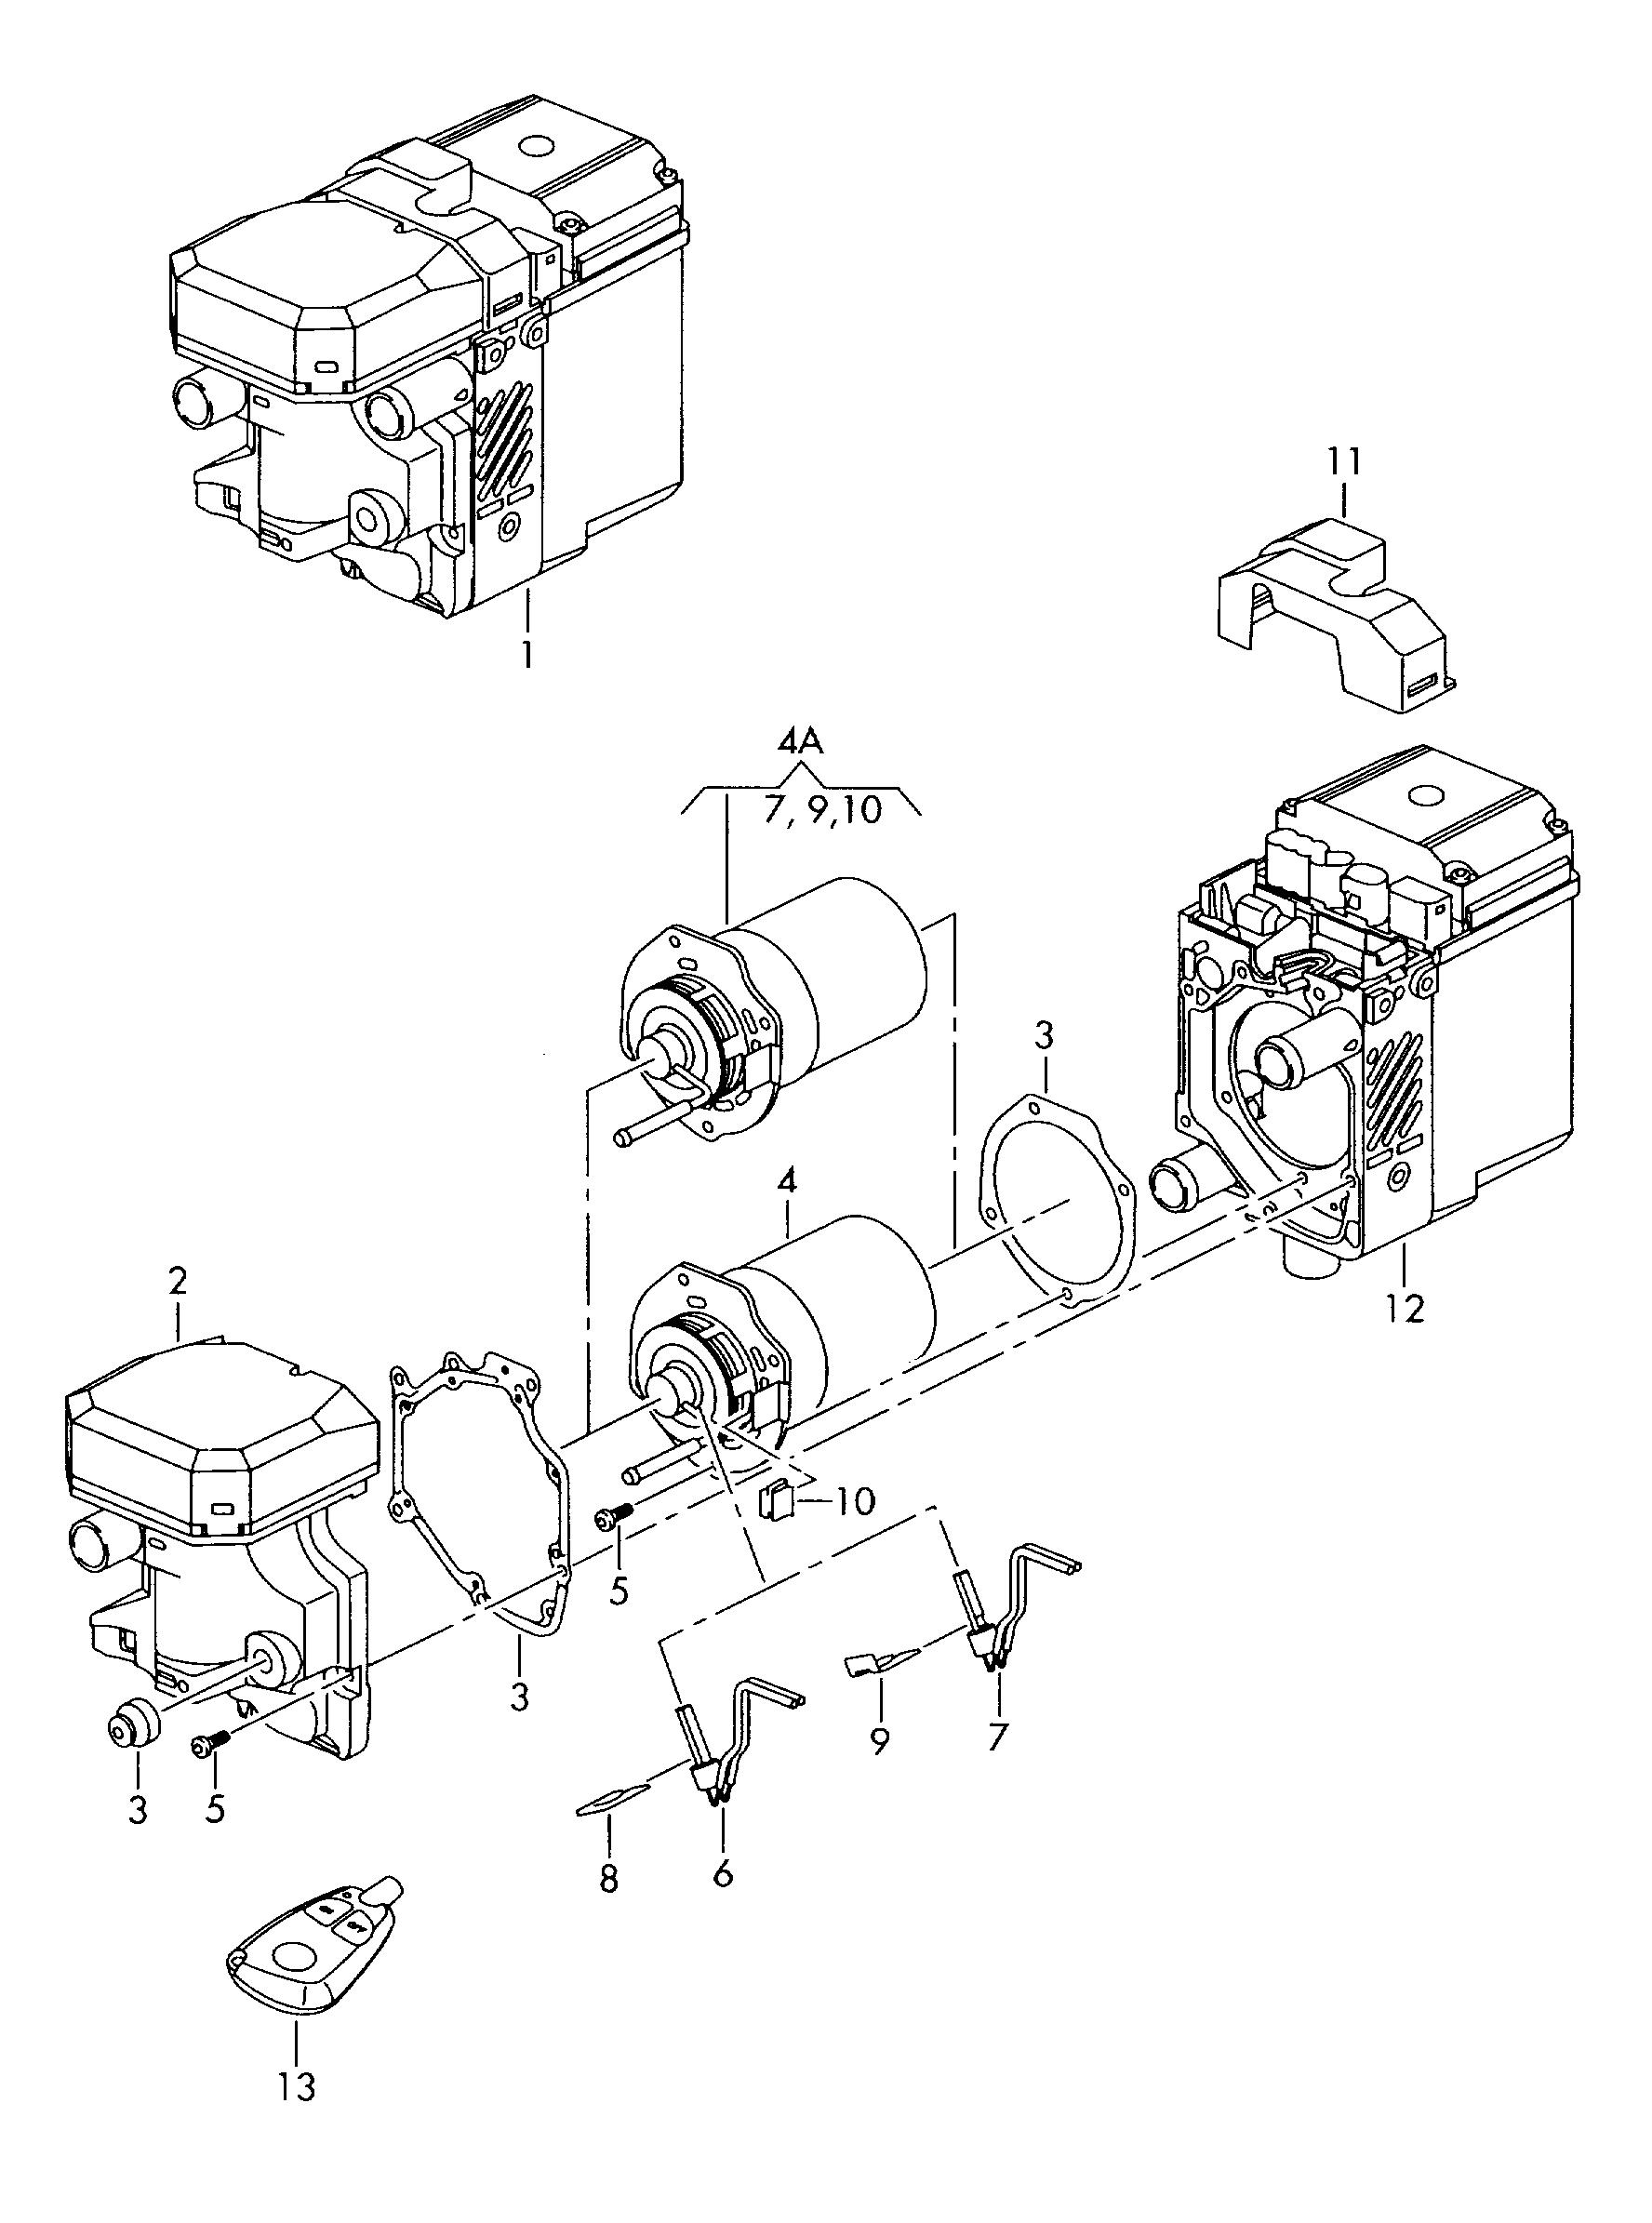 Audi Q7 2007 2009 Auxiliary Heater For Coolant Circuit Wiring Diagram Vag Etka